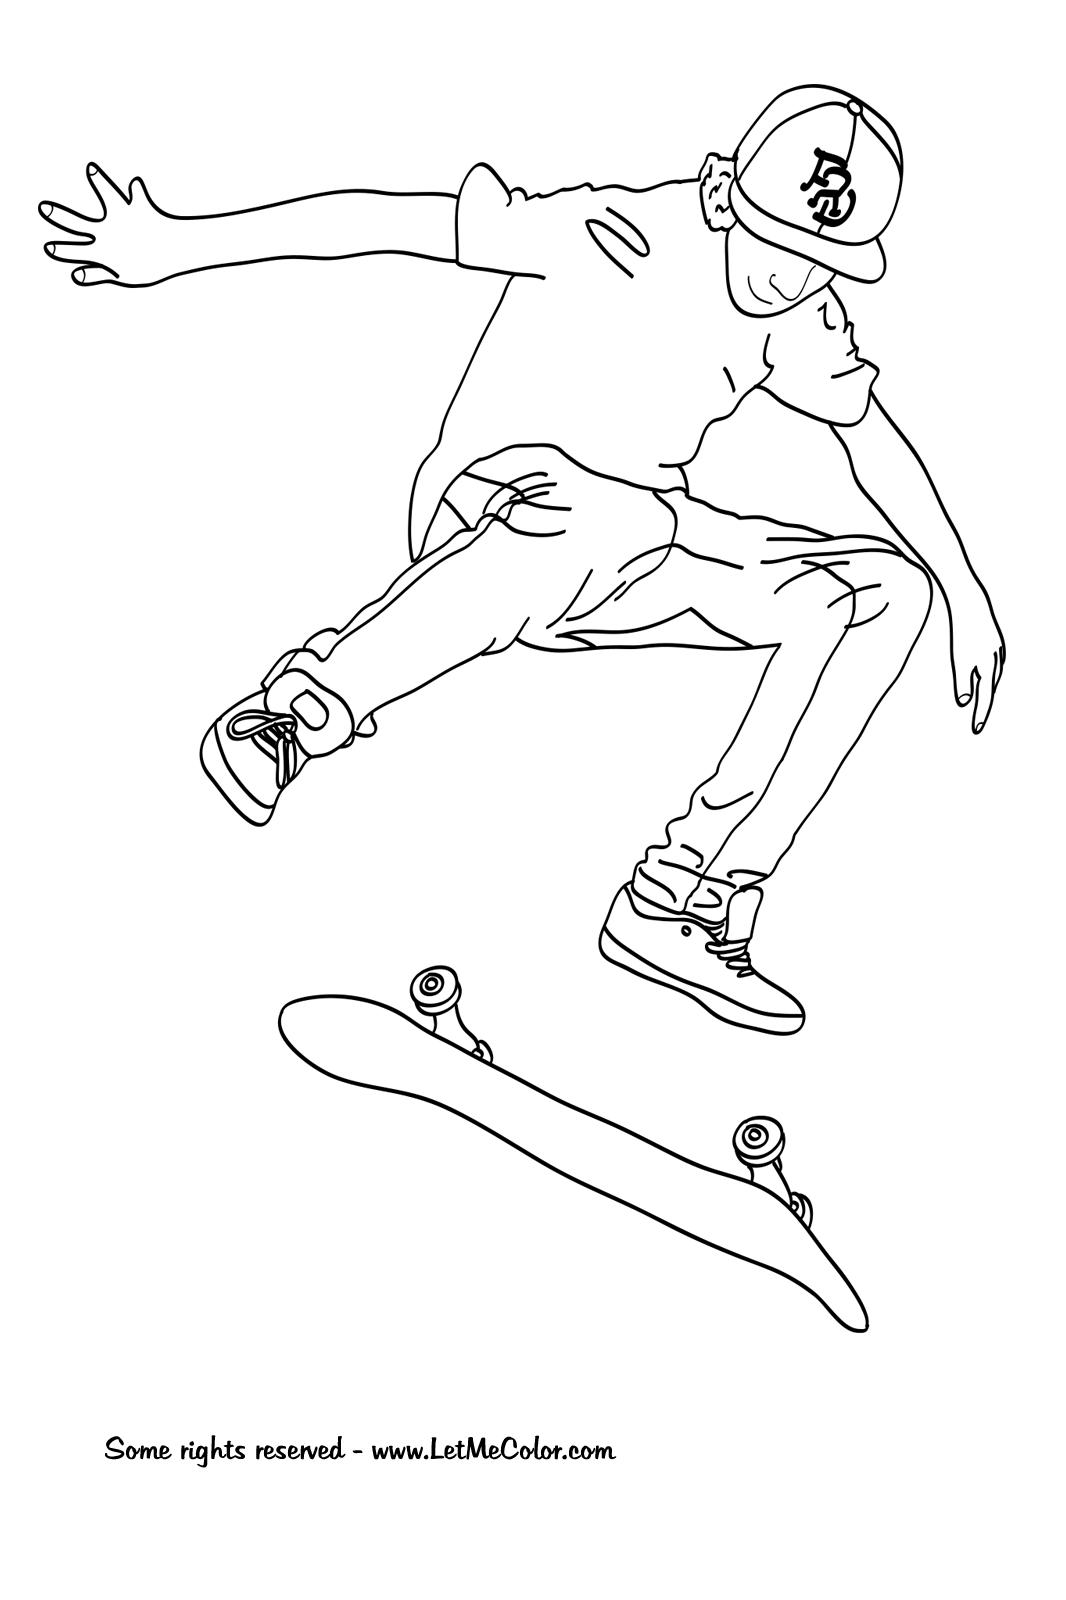 dessin en ligne skateboard